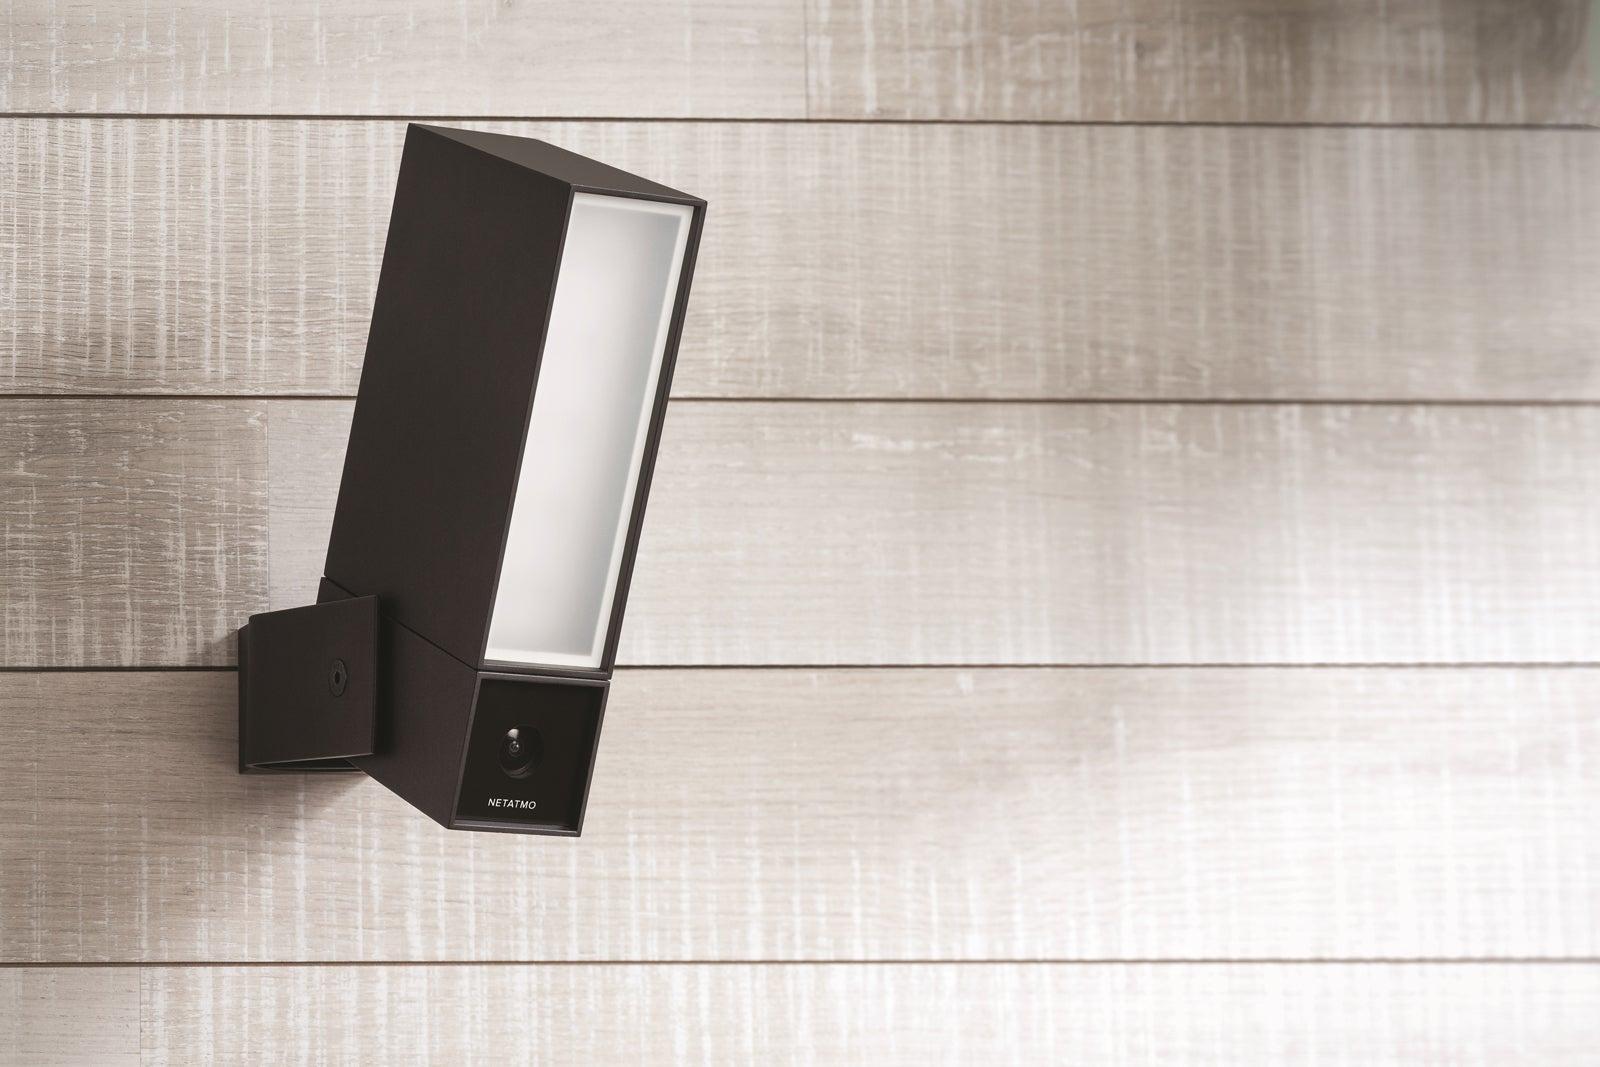 Netatmo Smart Outdoor Camera review | TechHive